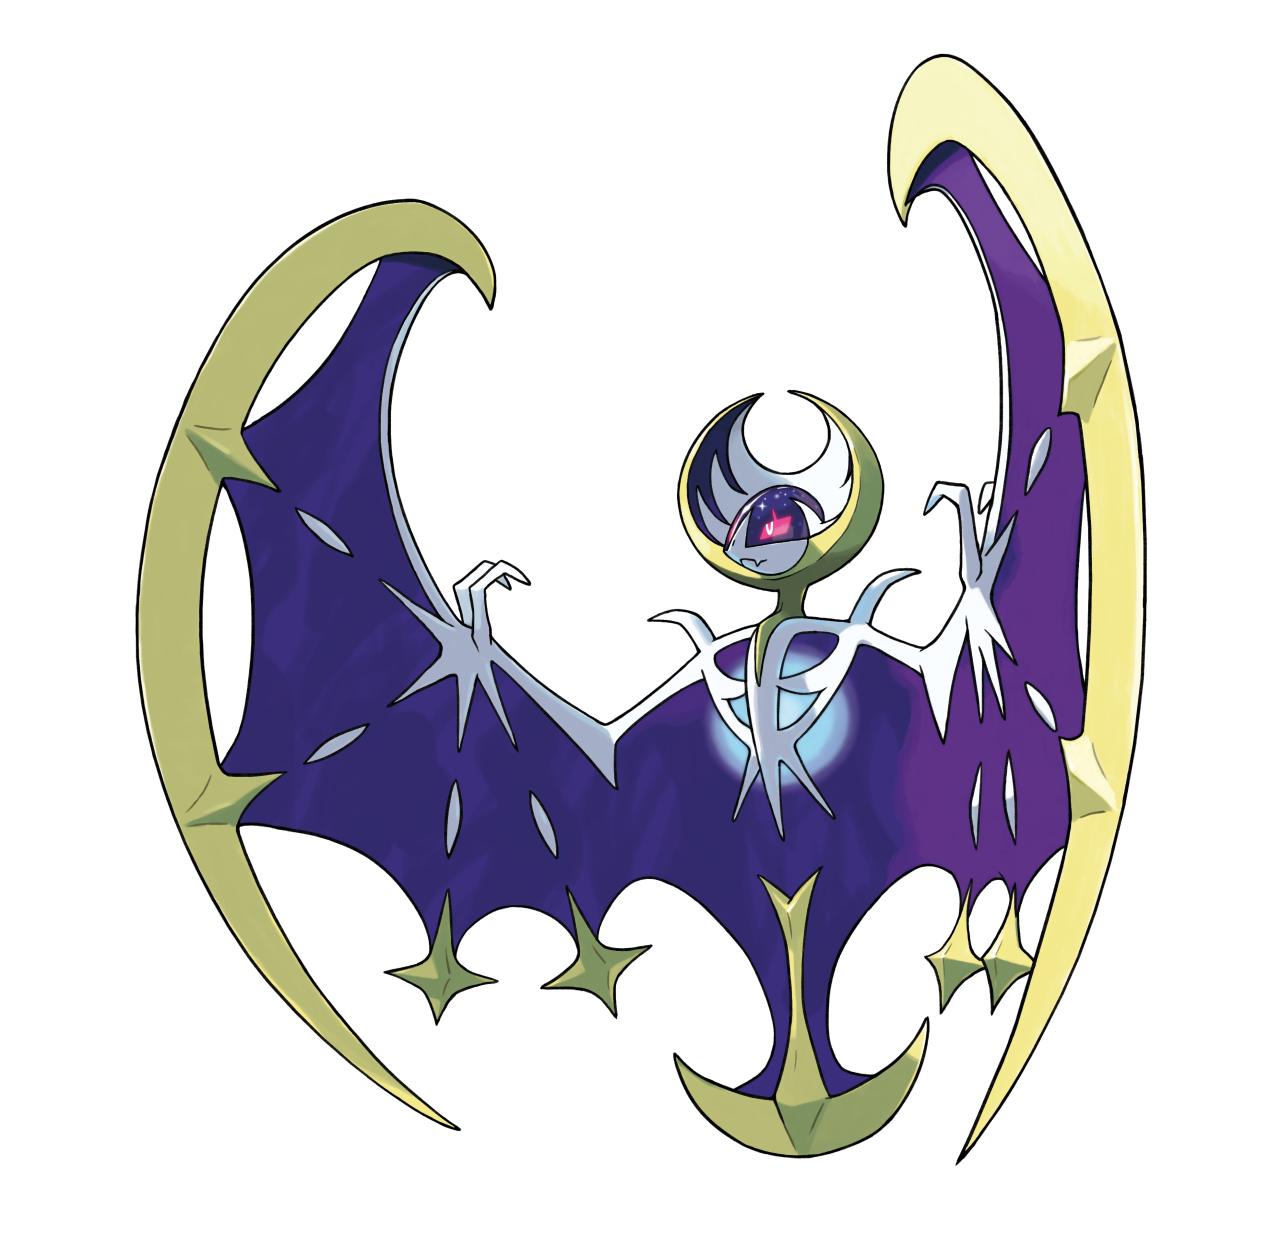 Pokemon Sun and Moon Pokedex round-up: names, descriptions ...